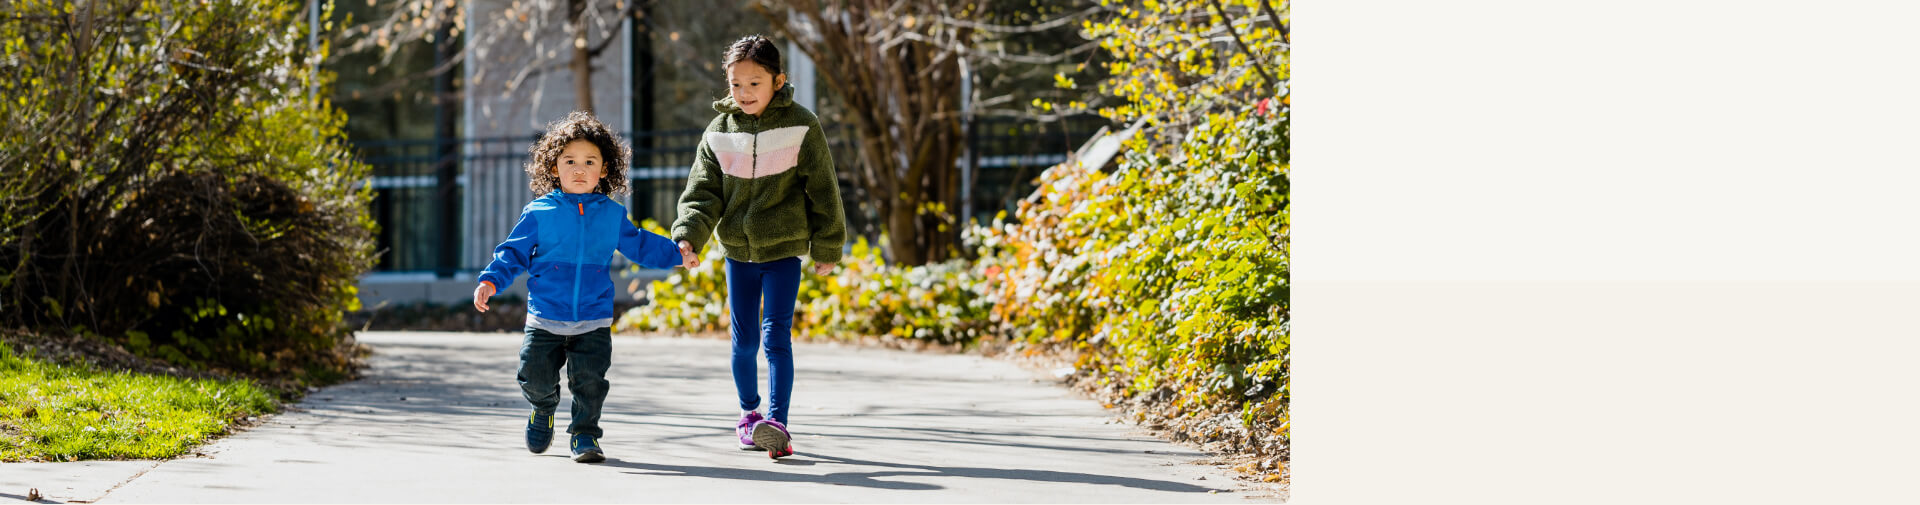 Young kids walking to school.